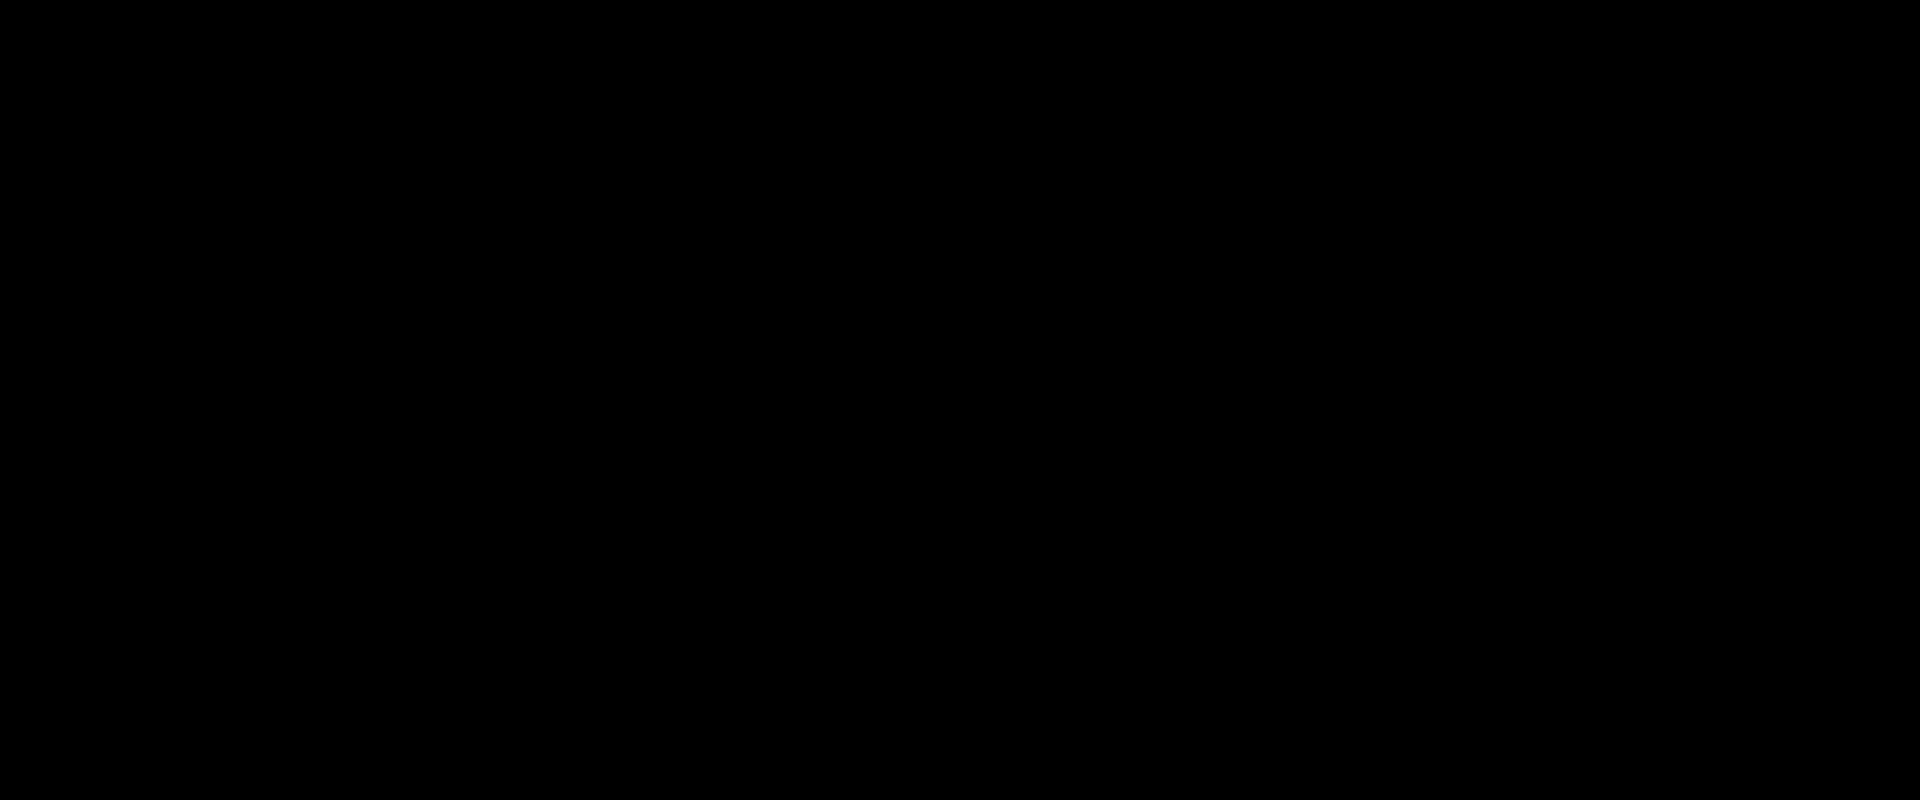 Rozesmat nebo zemrit 2018 CZ titulky HD